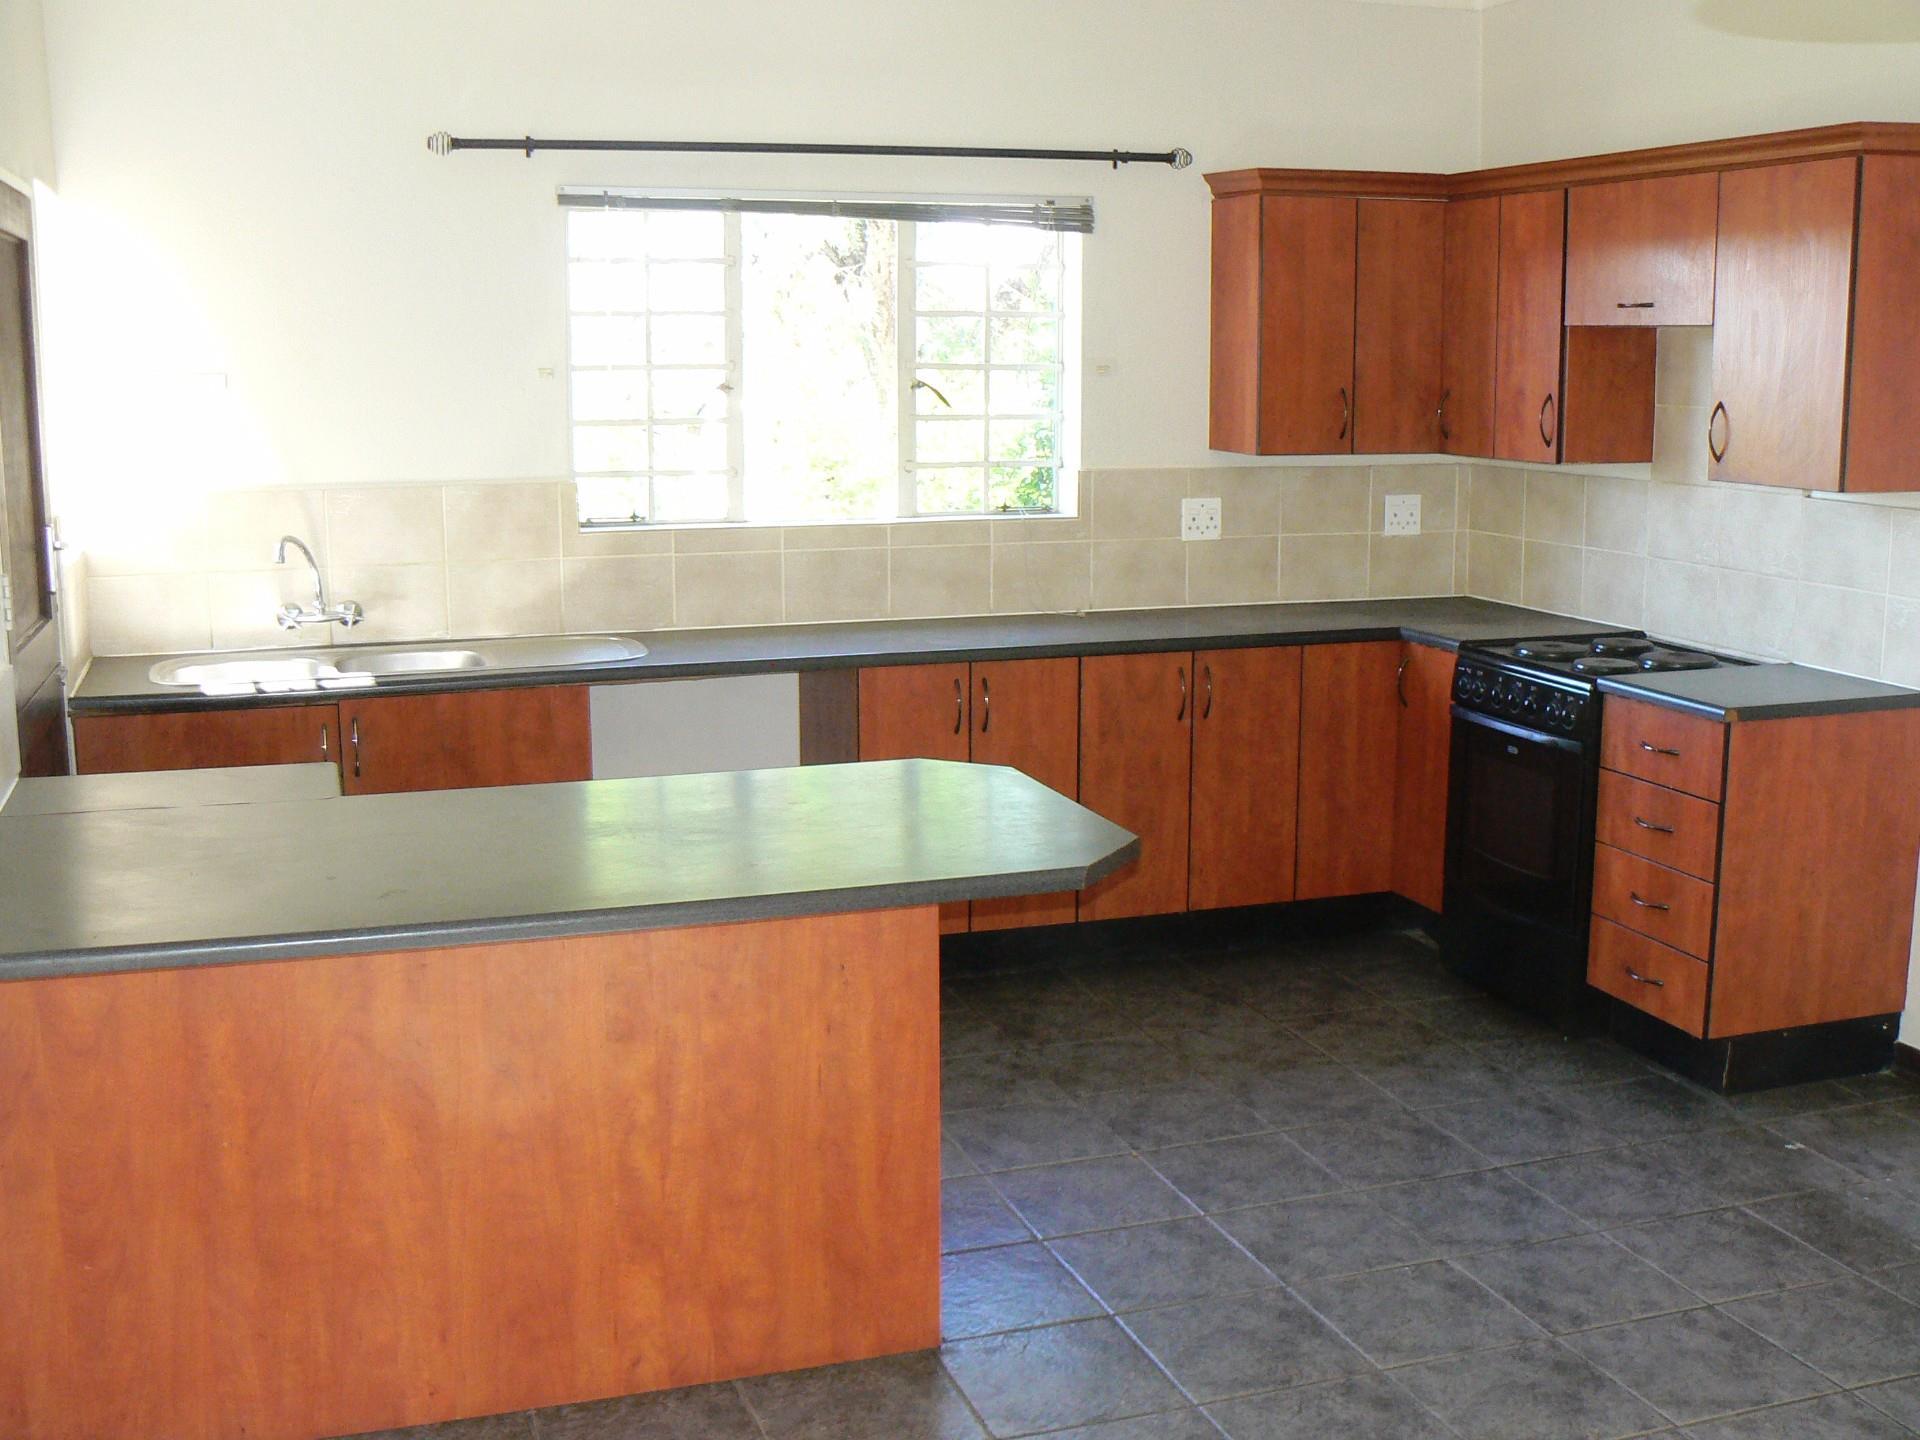 West Acres & Ext property for sale. Ref No: 13485783. Picture no 2